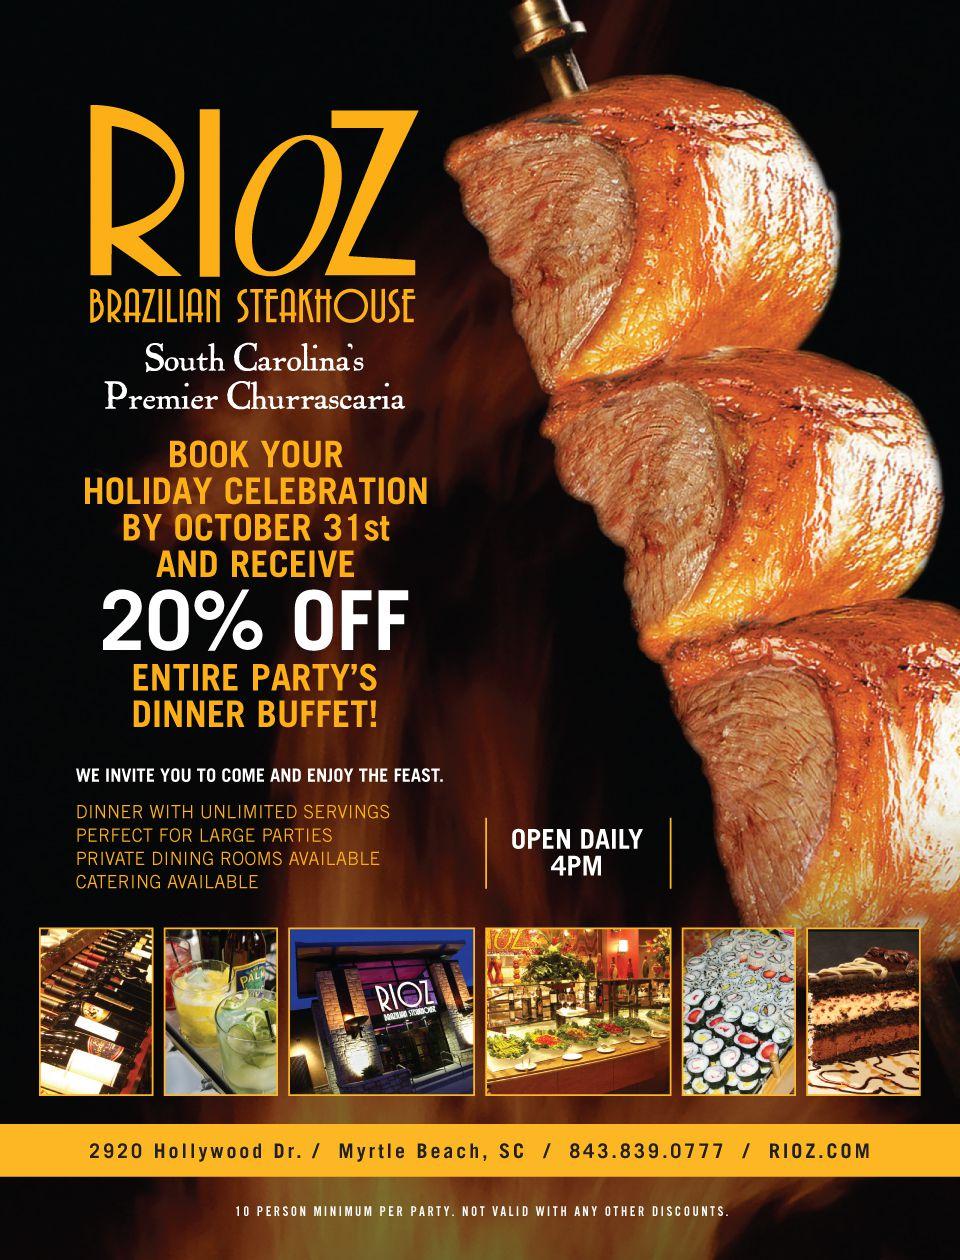 (TB400)Rioz Book Holiday Celebration.jpg